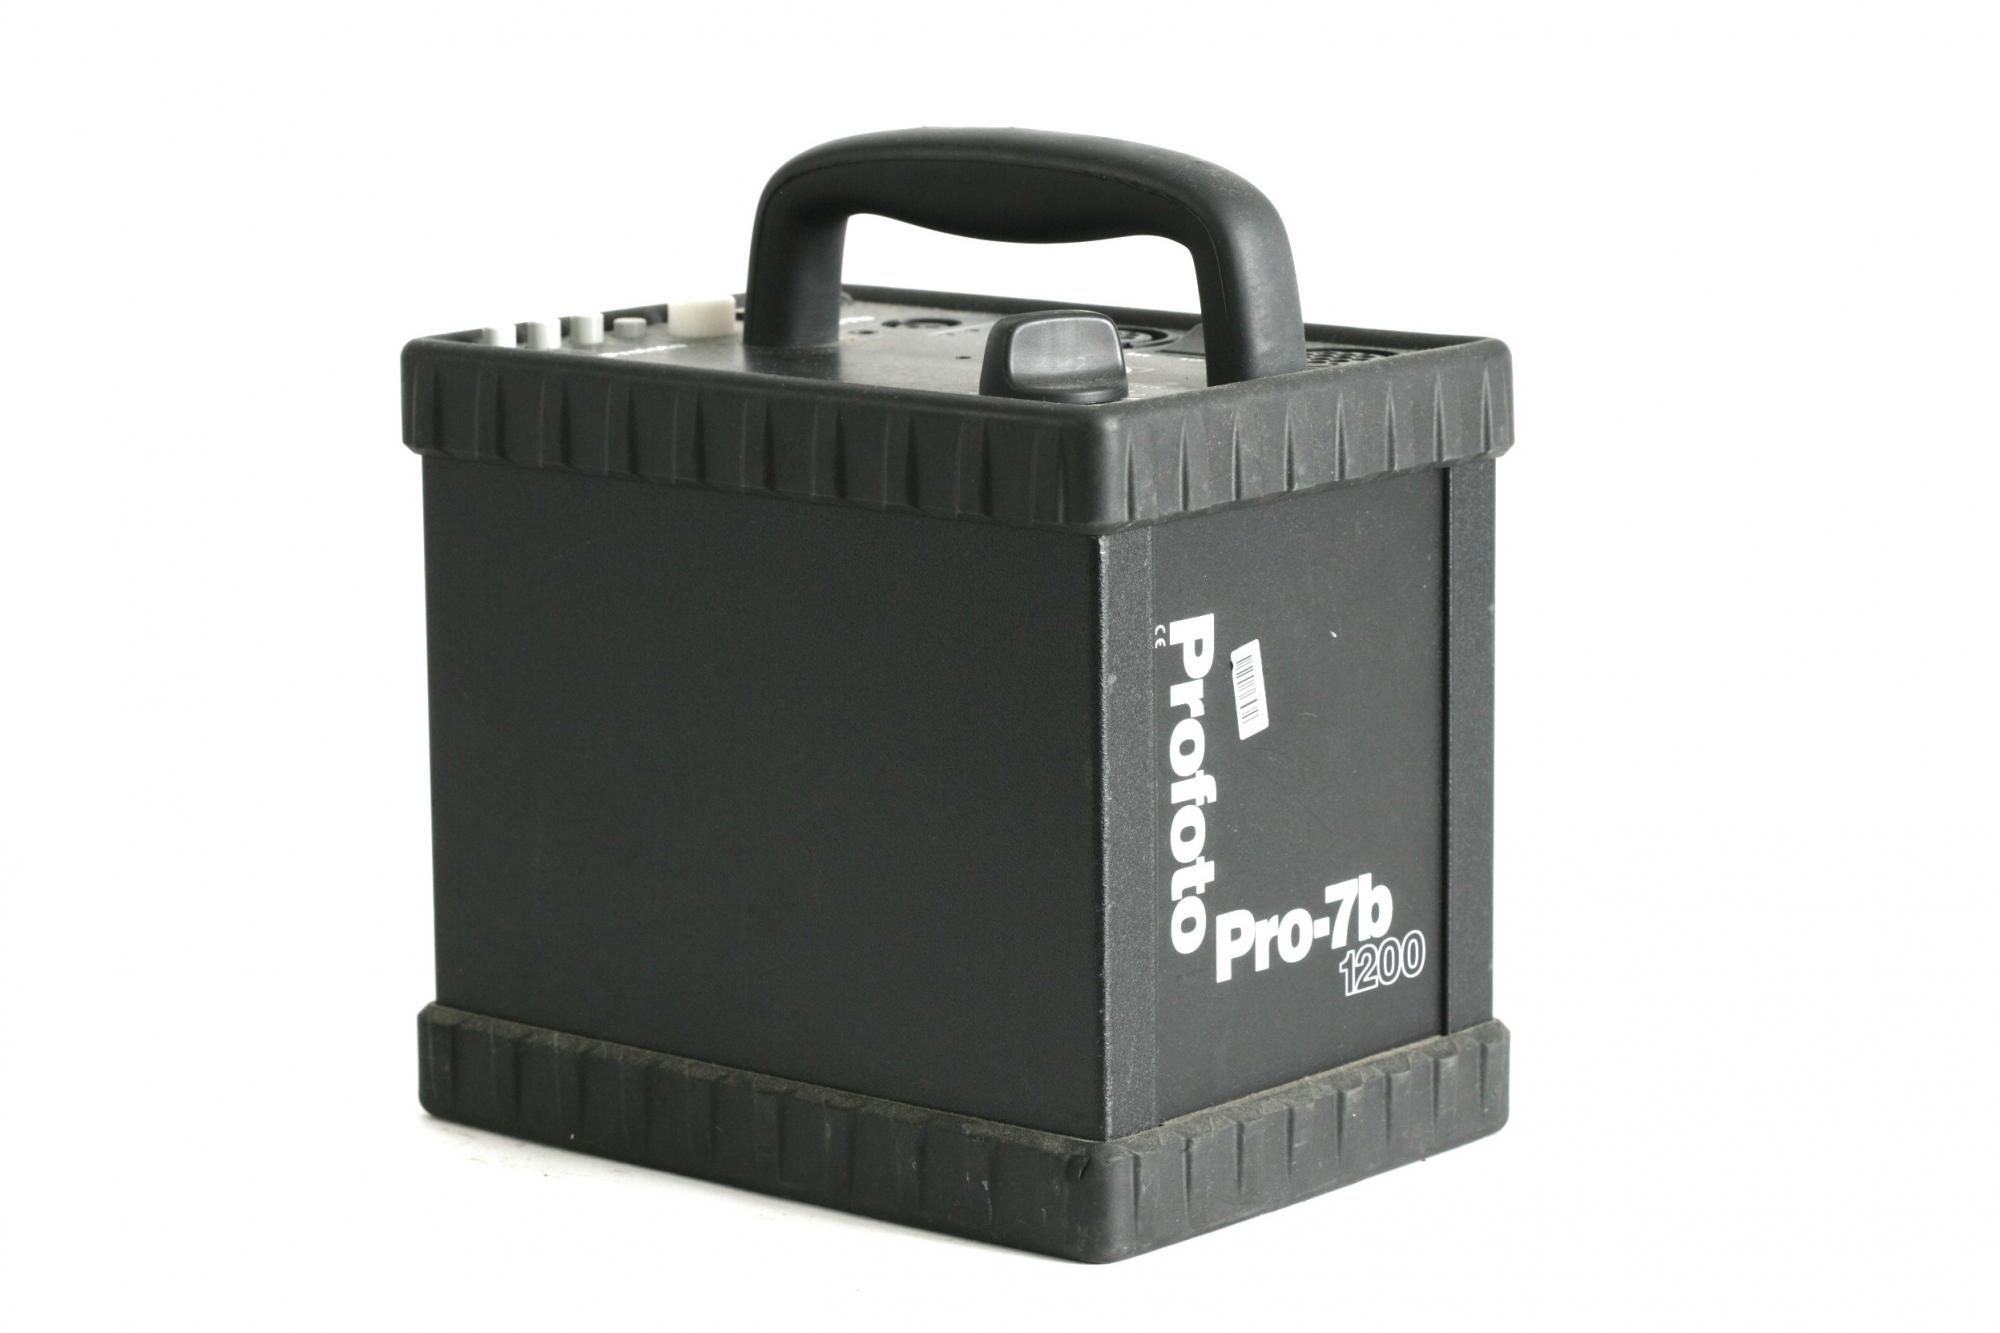 3 x Profoto 7b generators + Chargers £45-00 per generator.